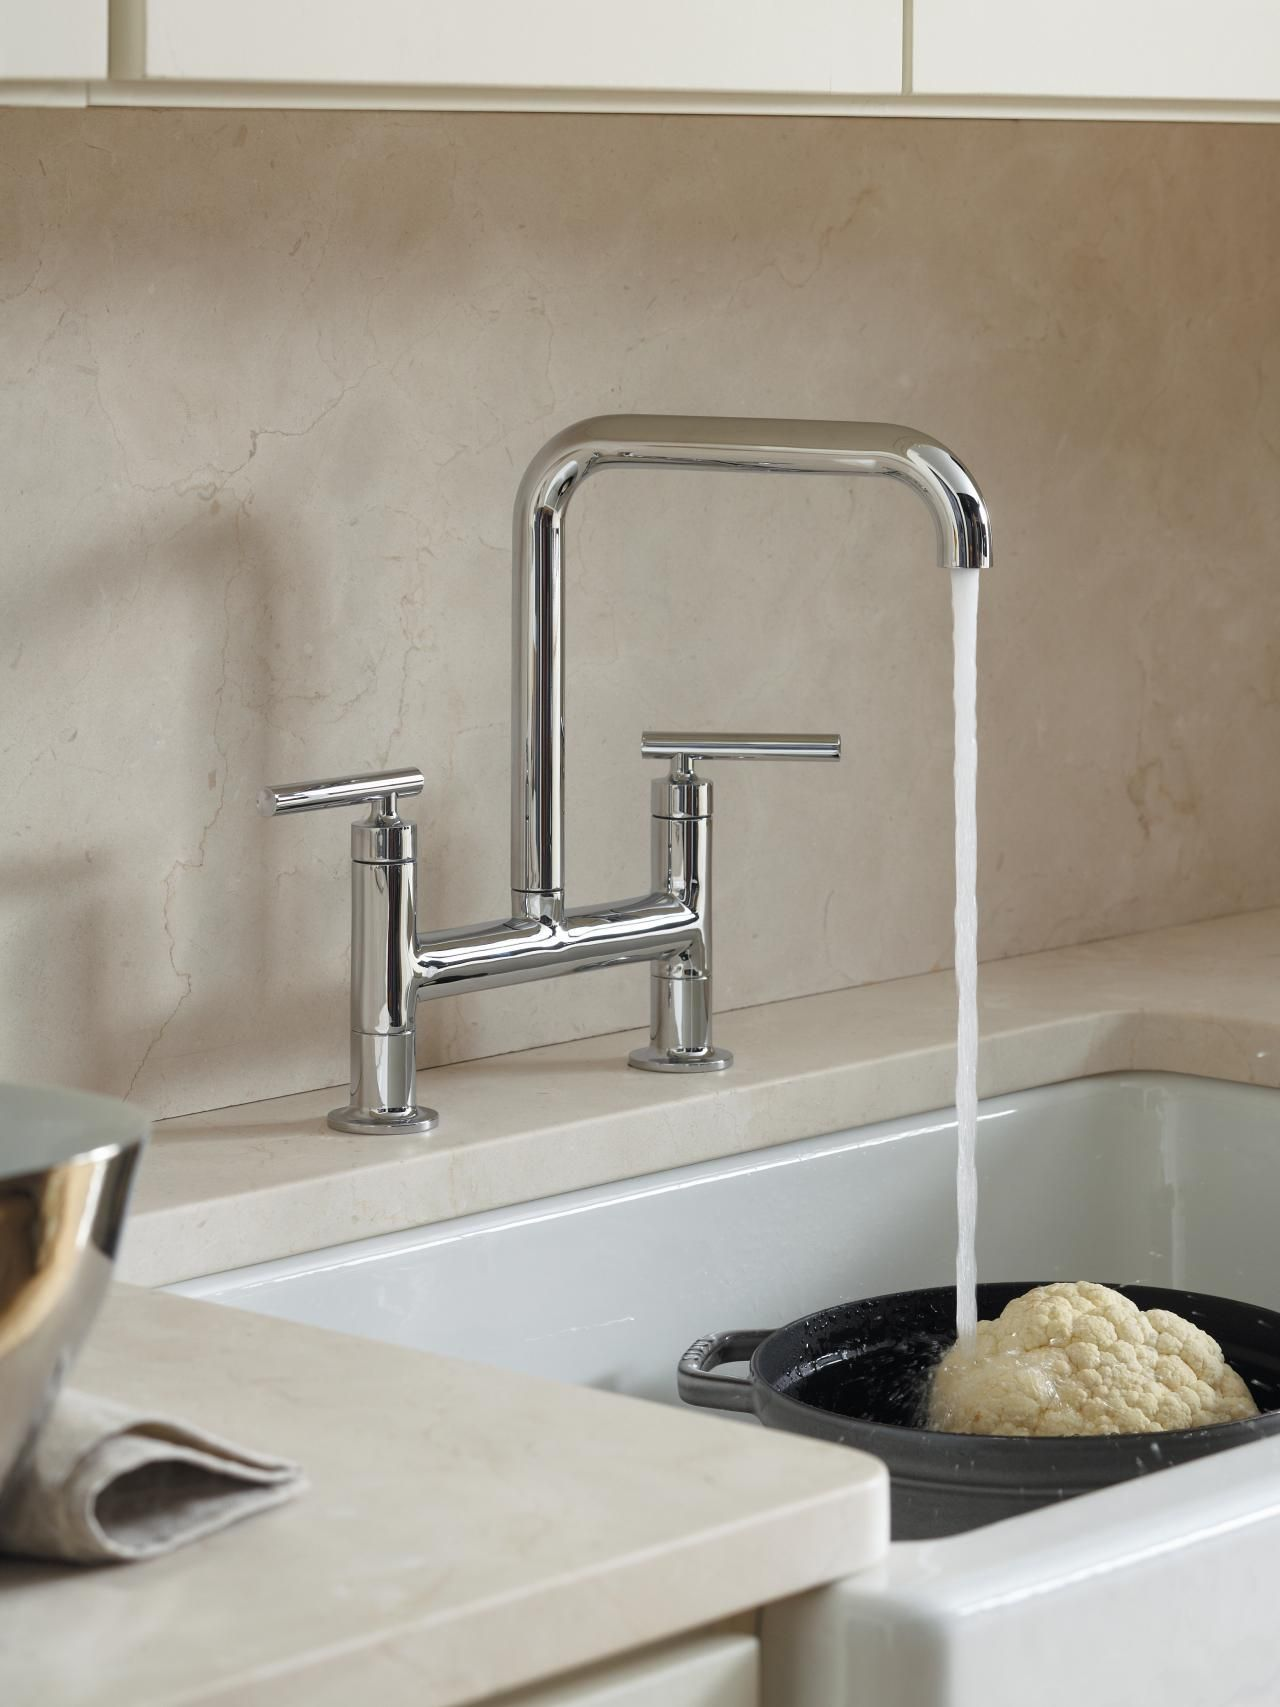 best images about kitchens on pinterest kitchen kitchen ideas